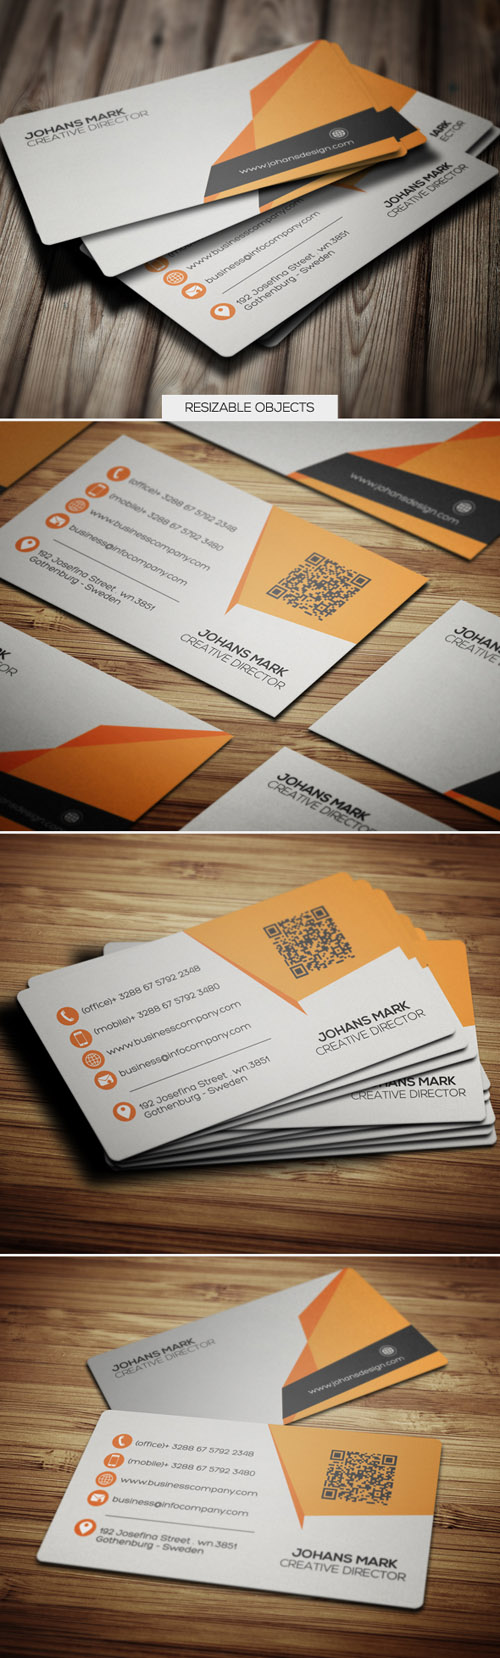 business cards template design - 1